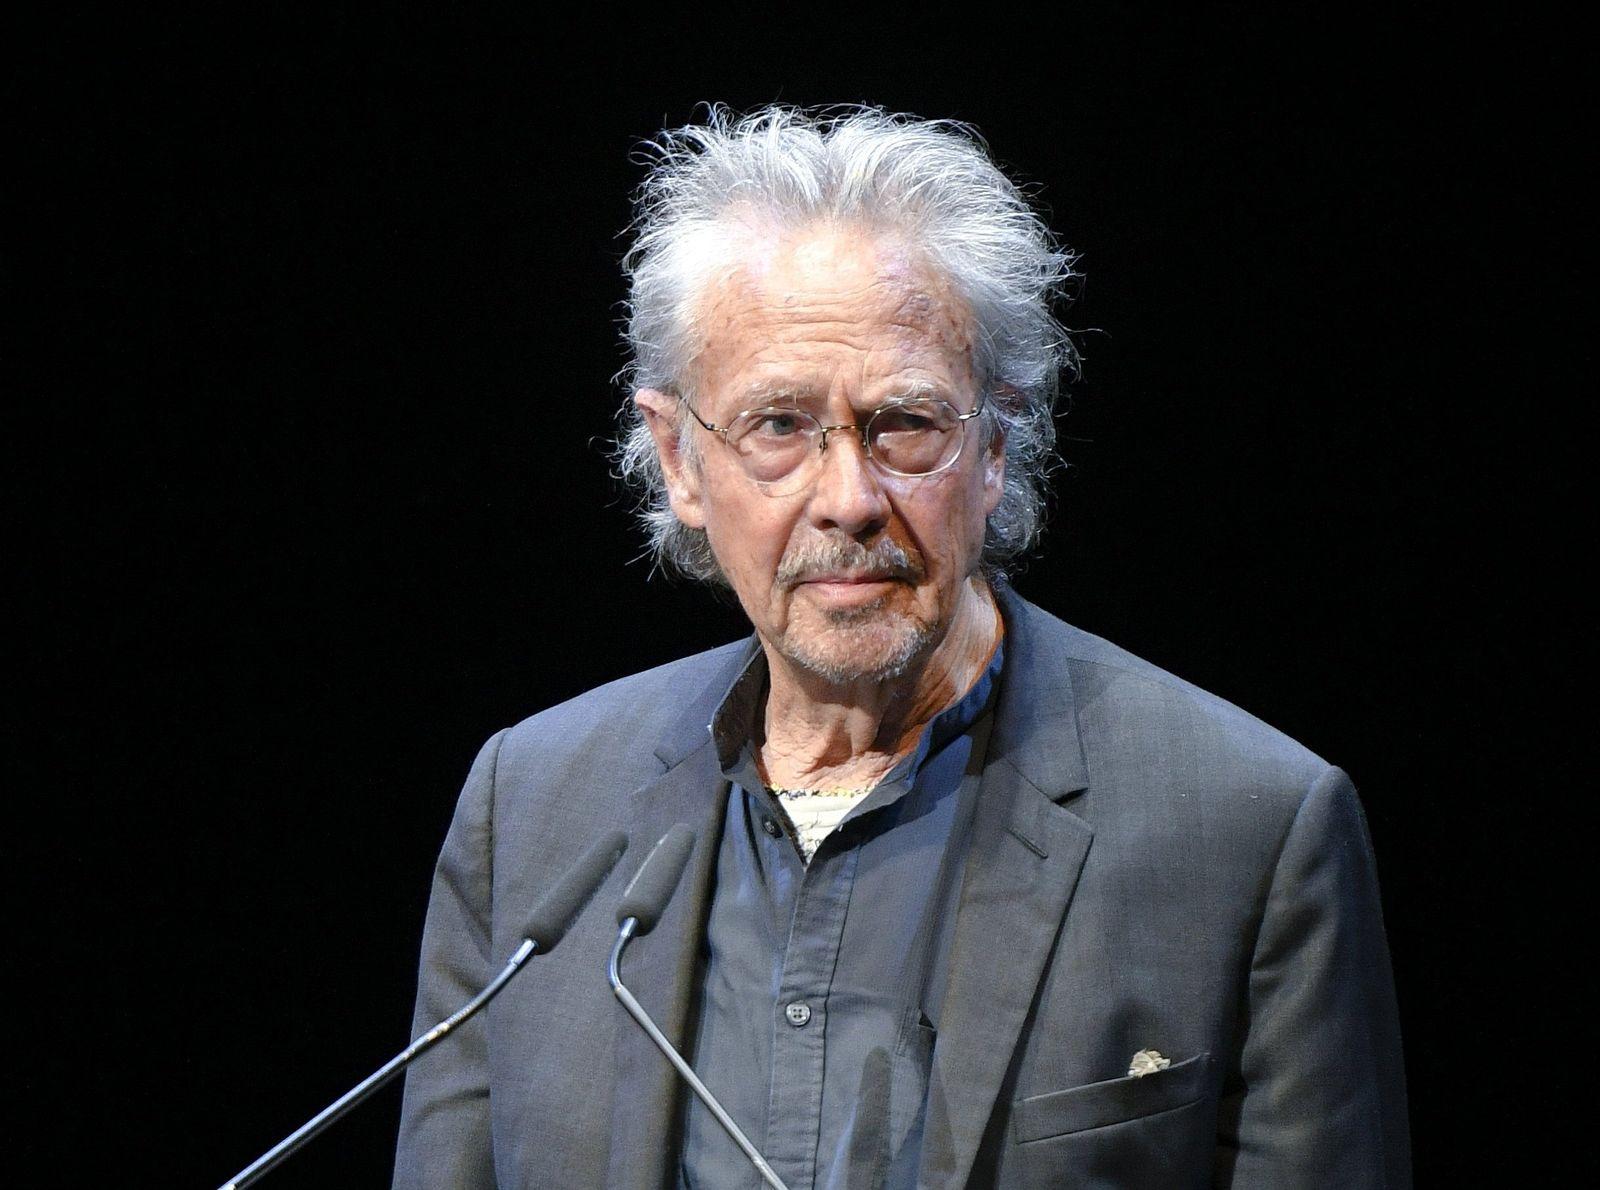 Peter Handke/ Literaturnobelpreis